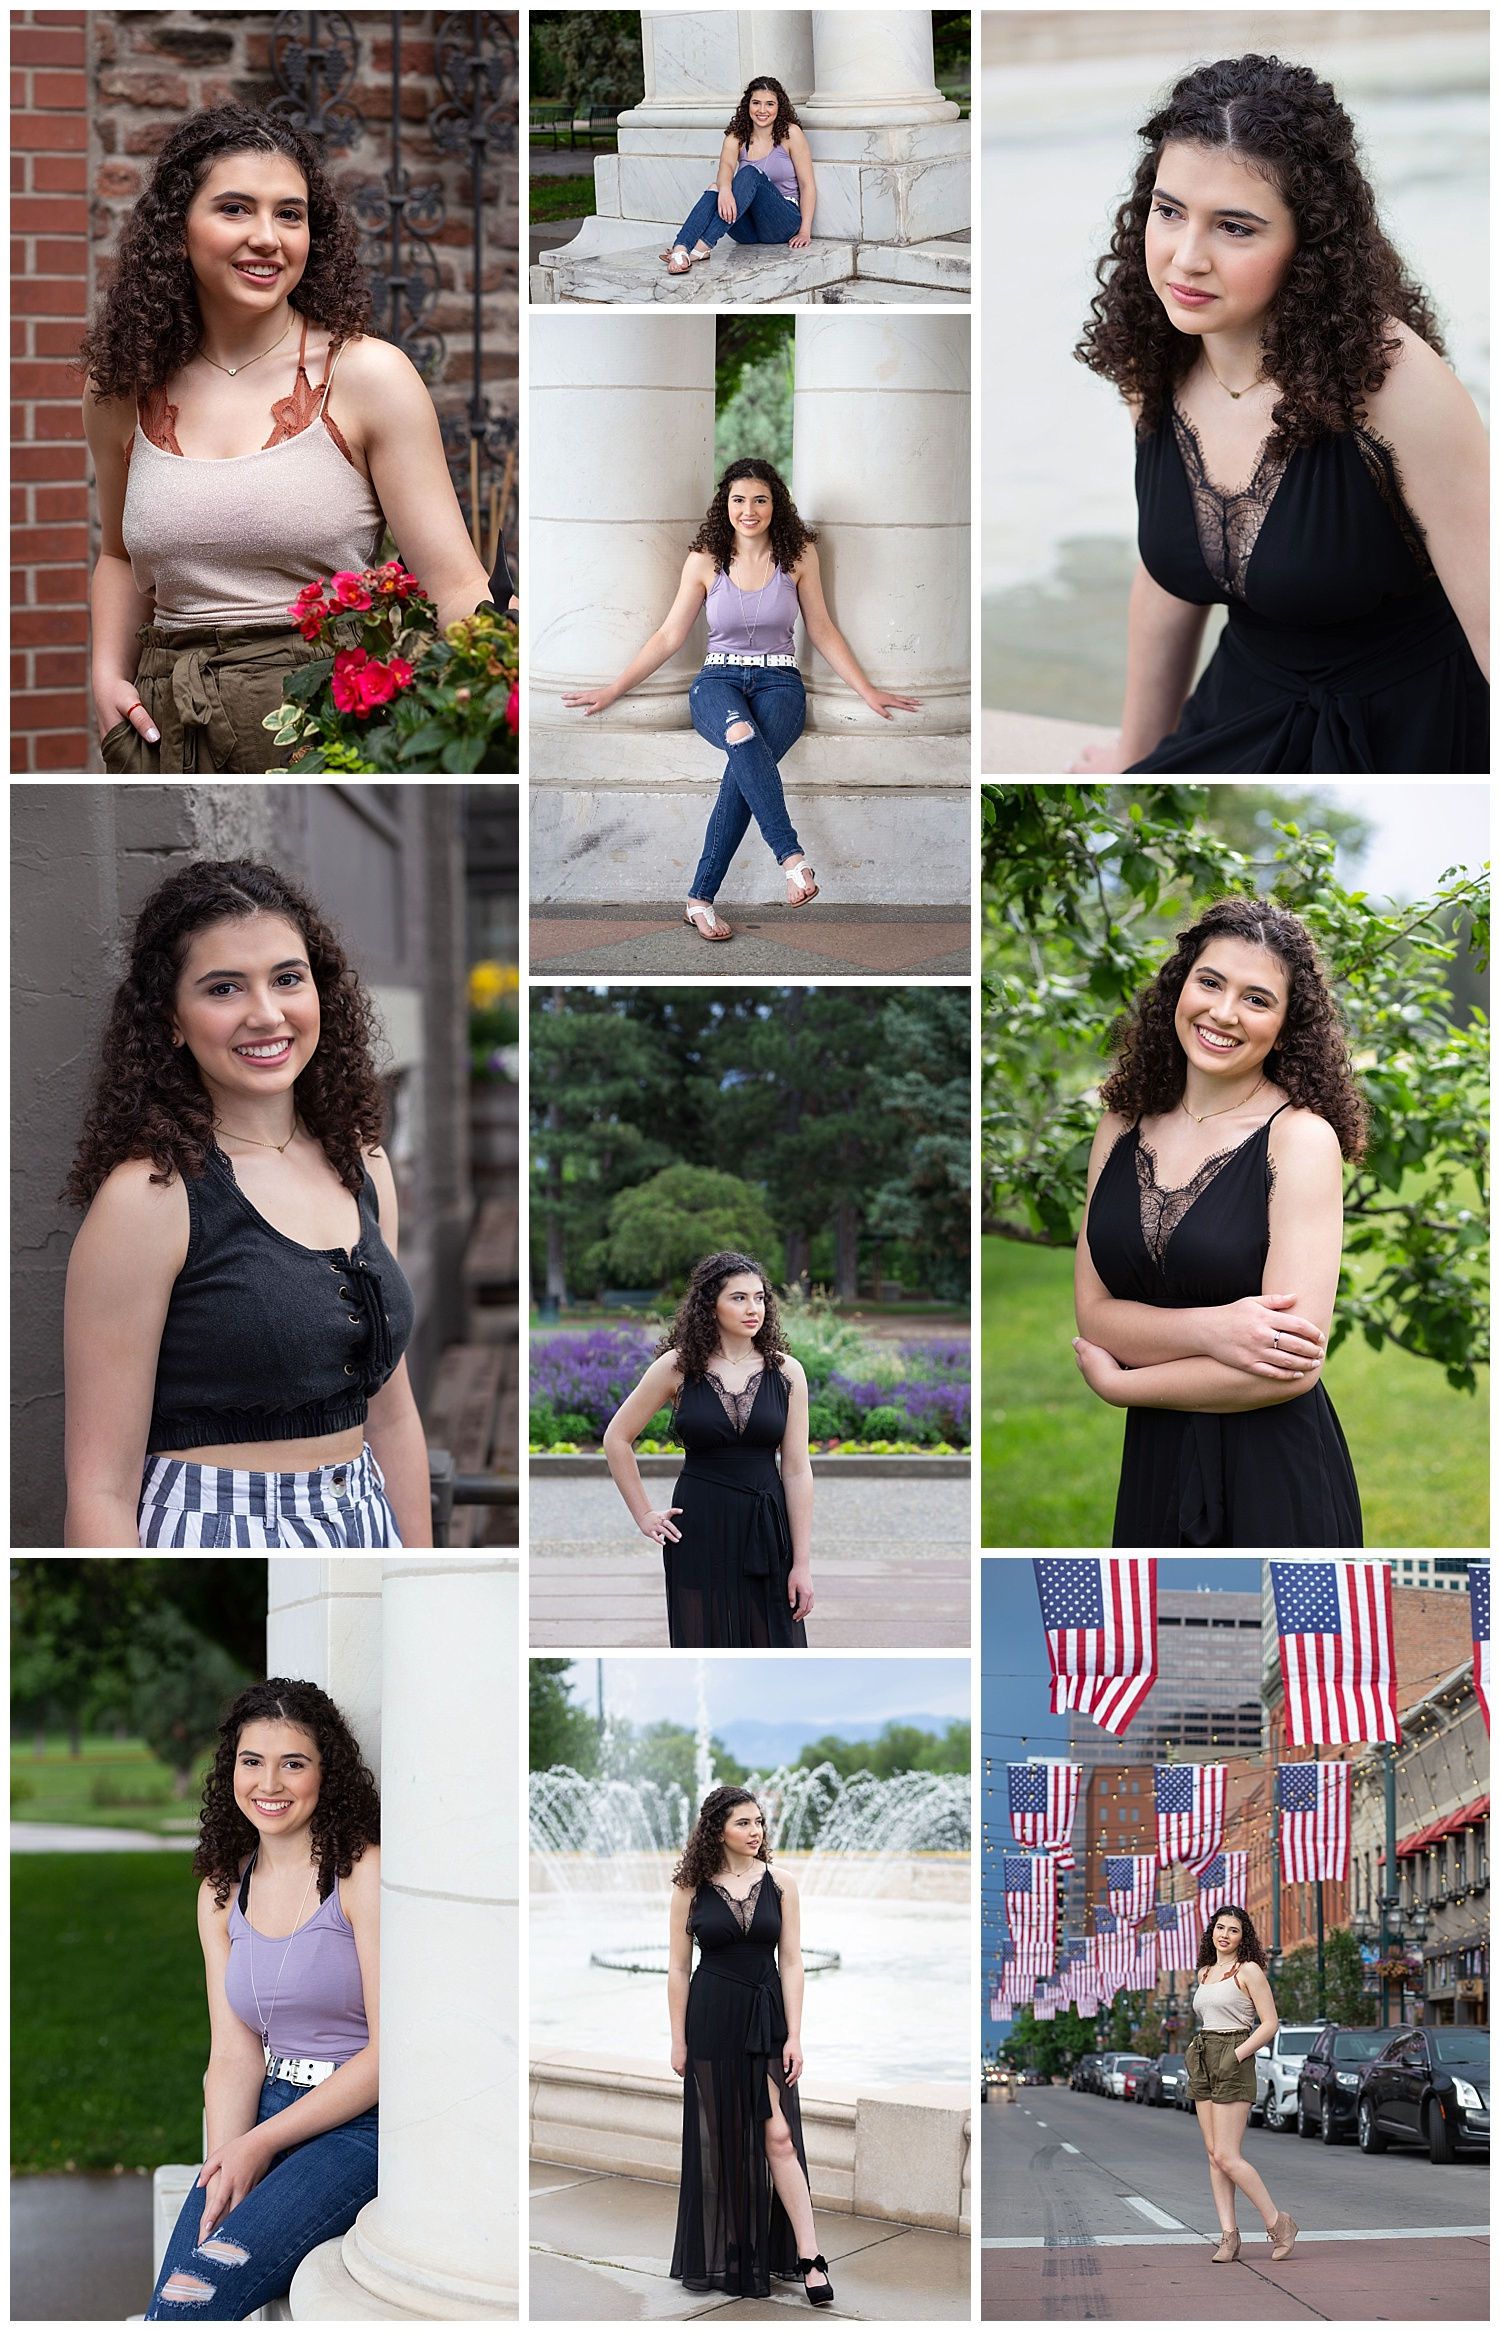 Bella had her high school senior portraits taken on June 30, 2019.